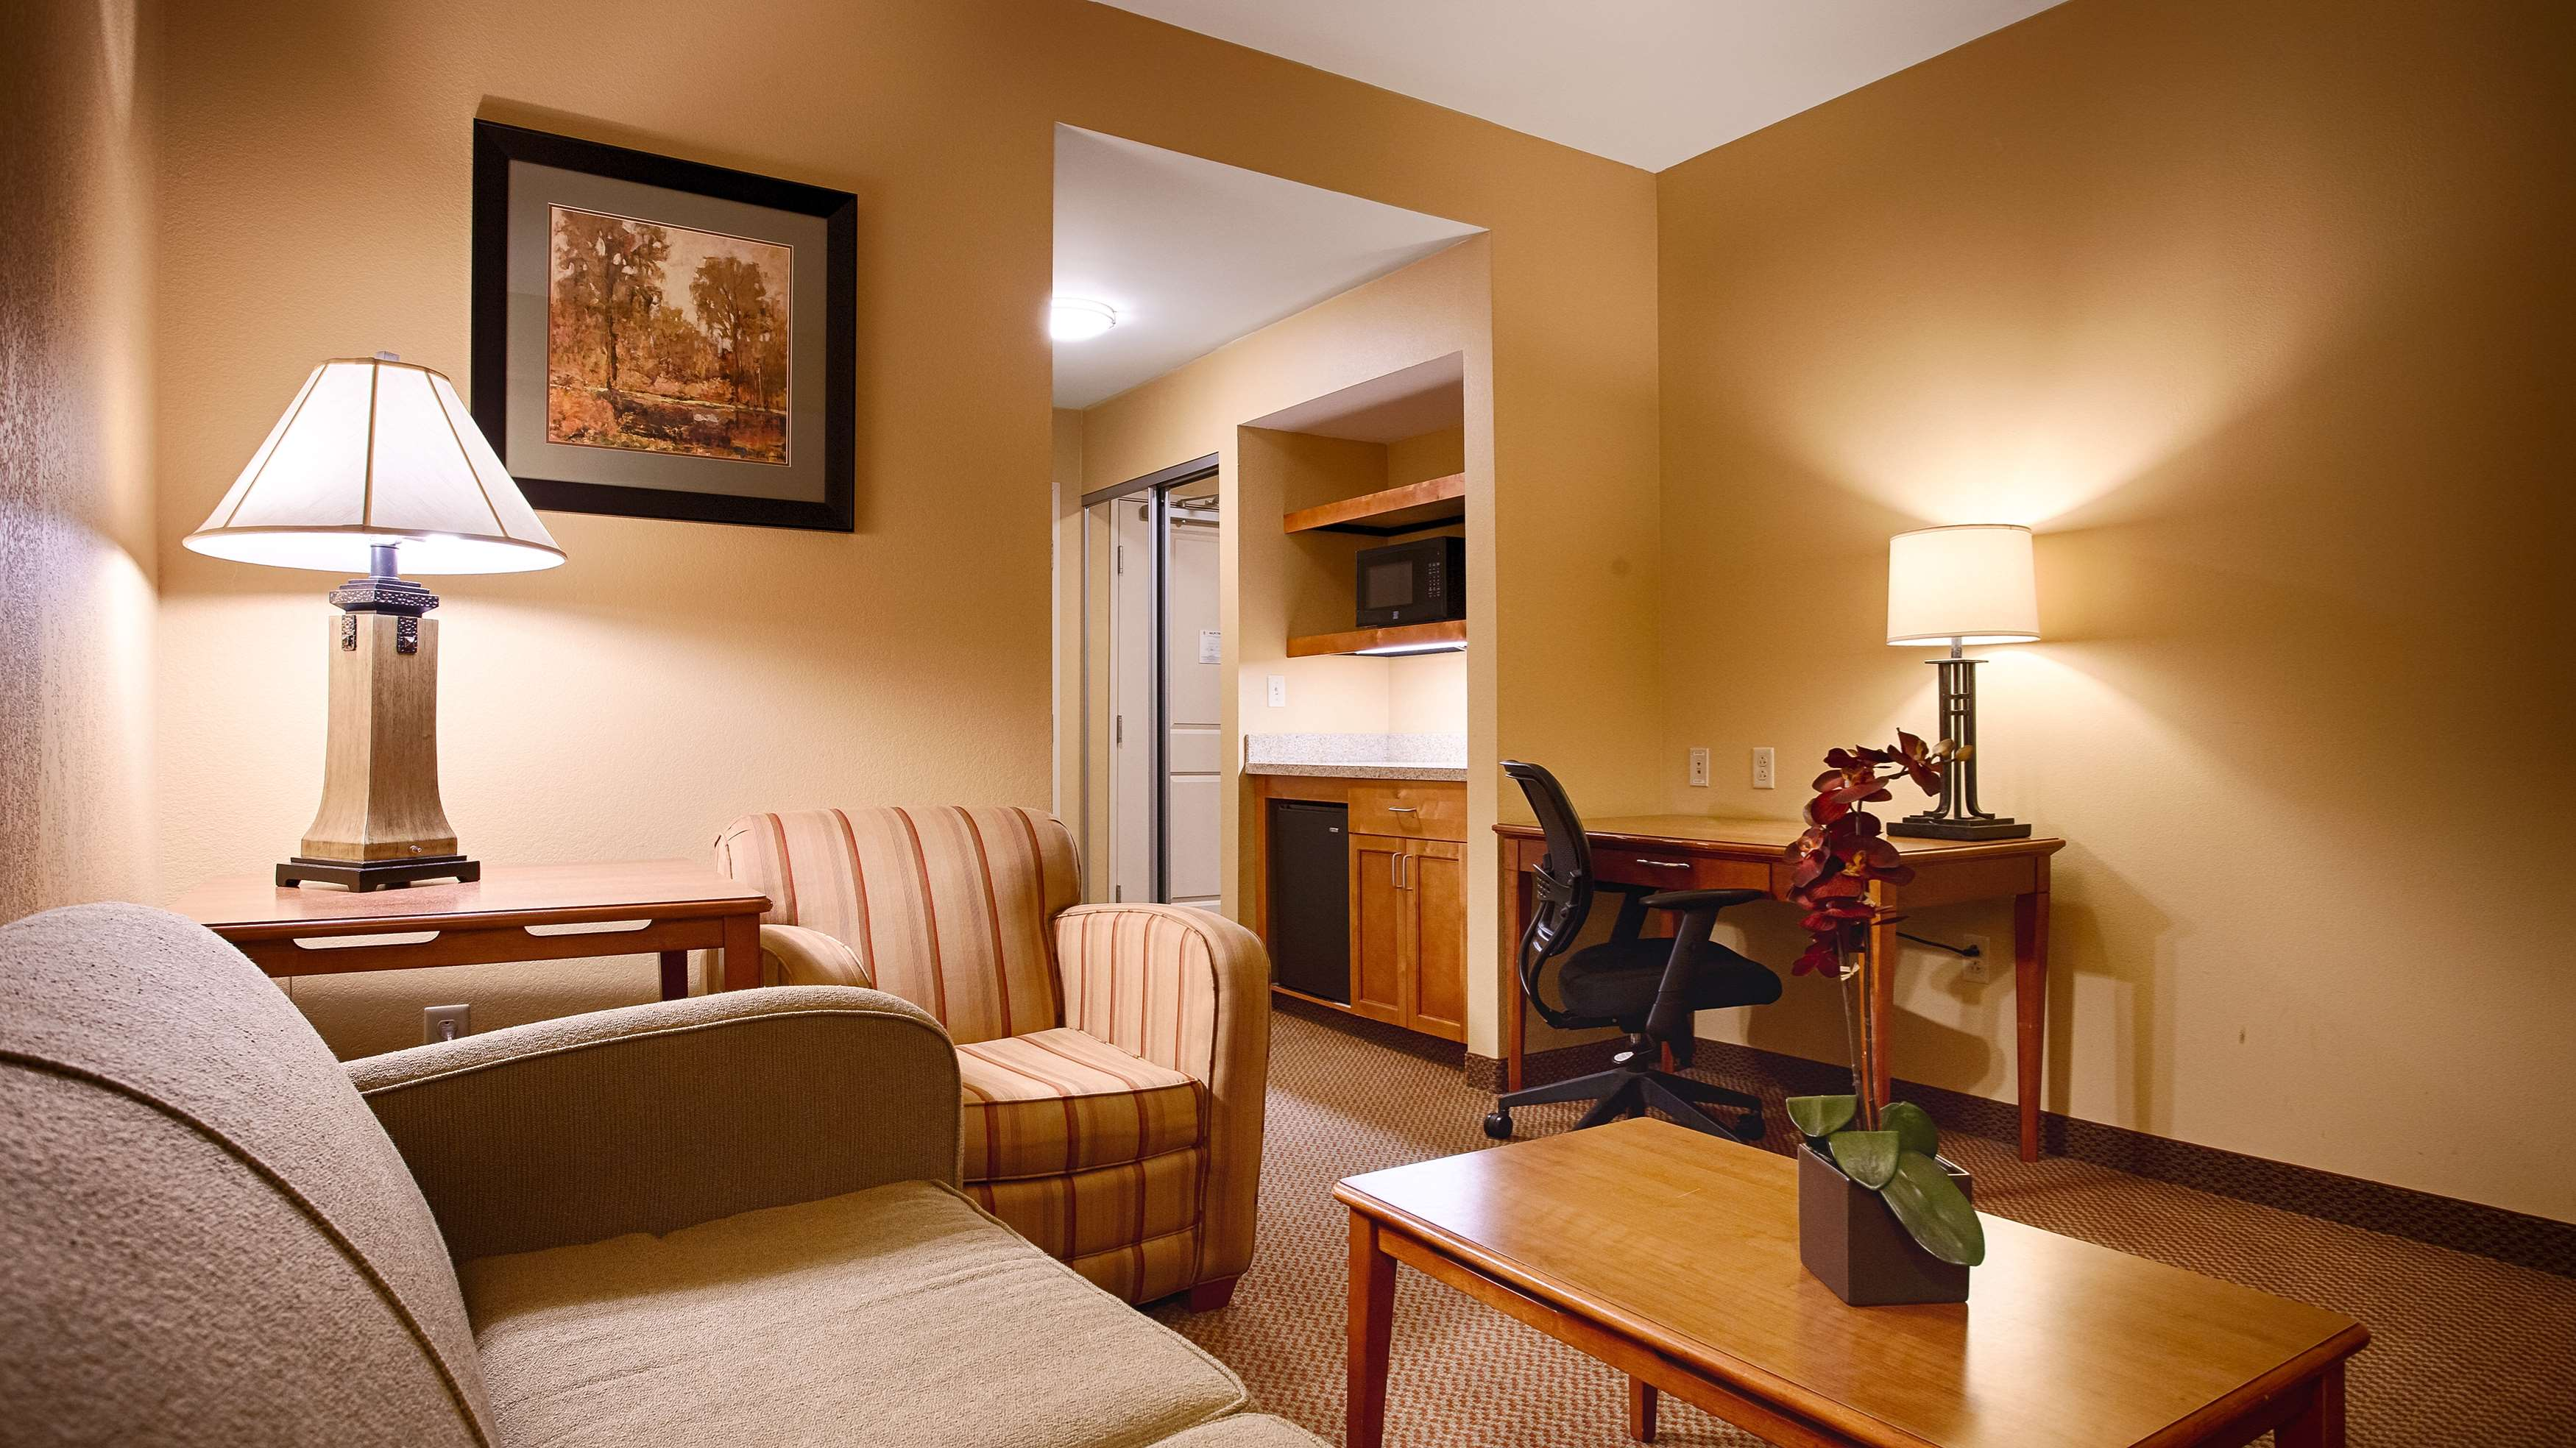 Best Western Plus University Park Inn & Suites image 19